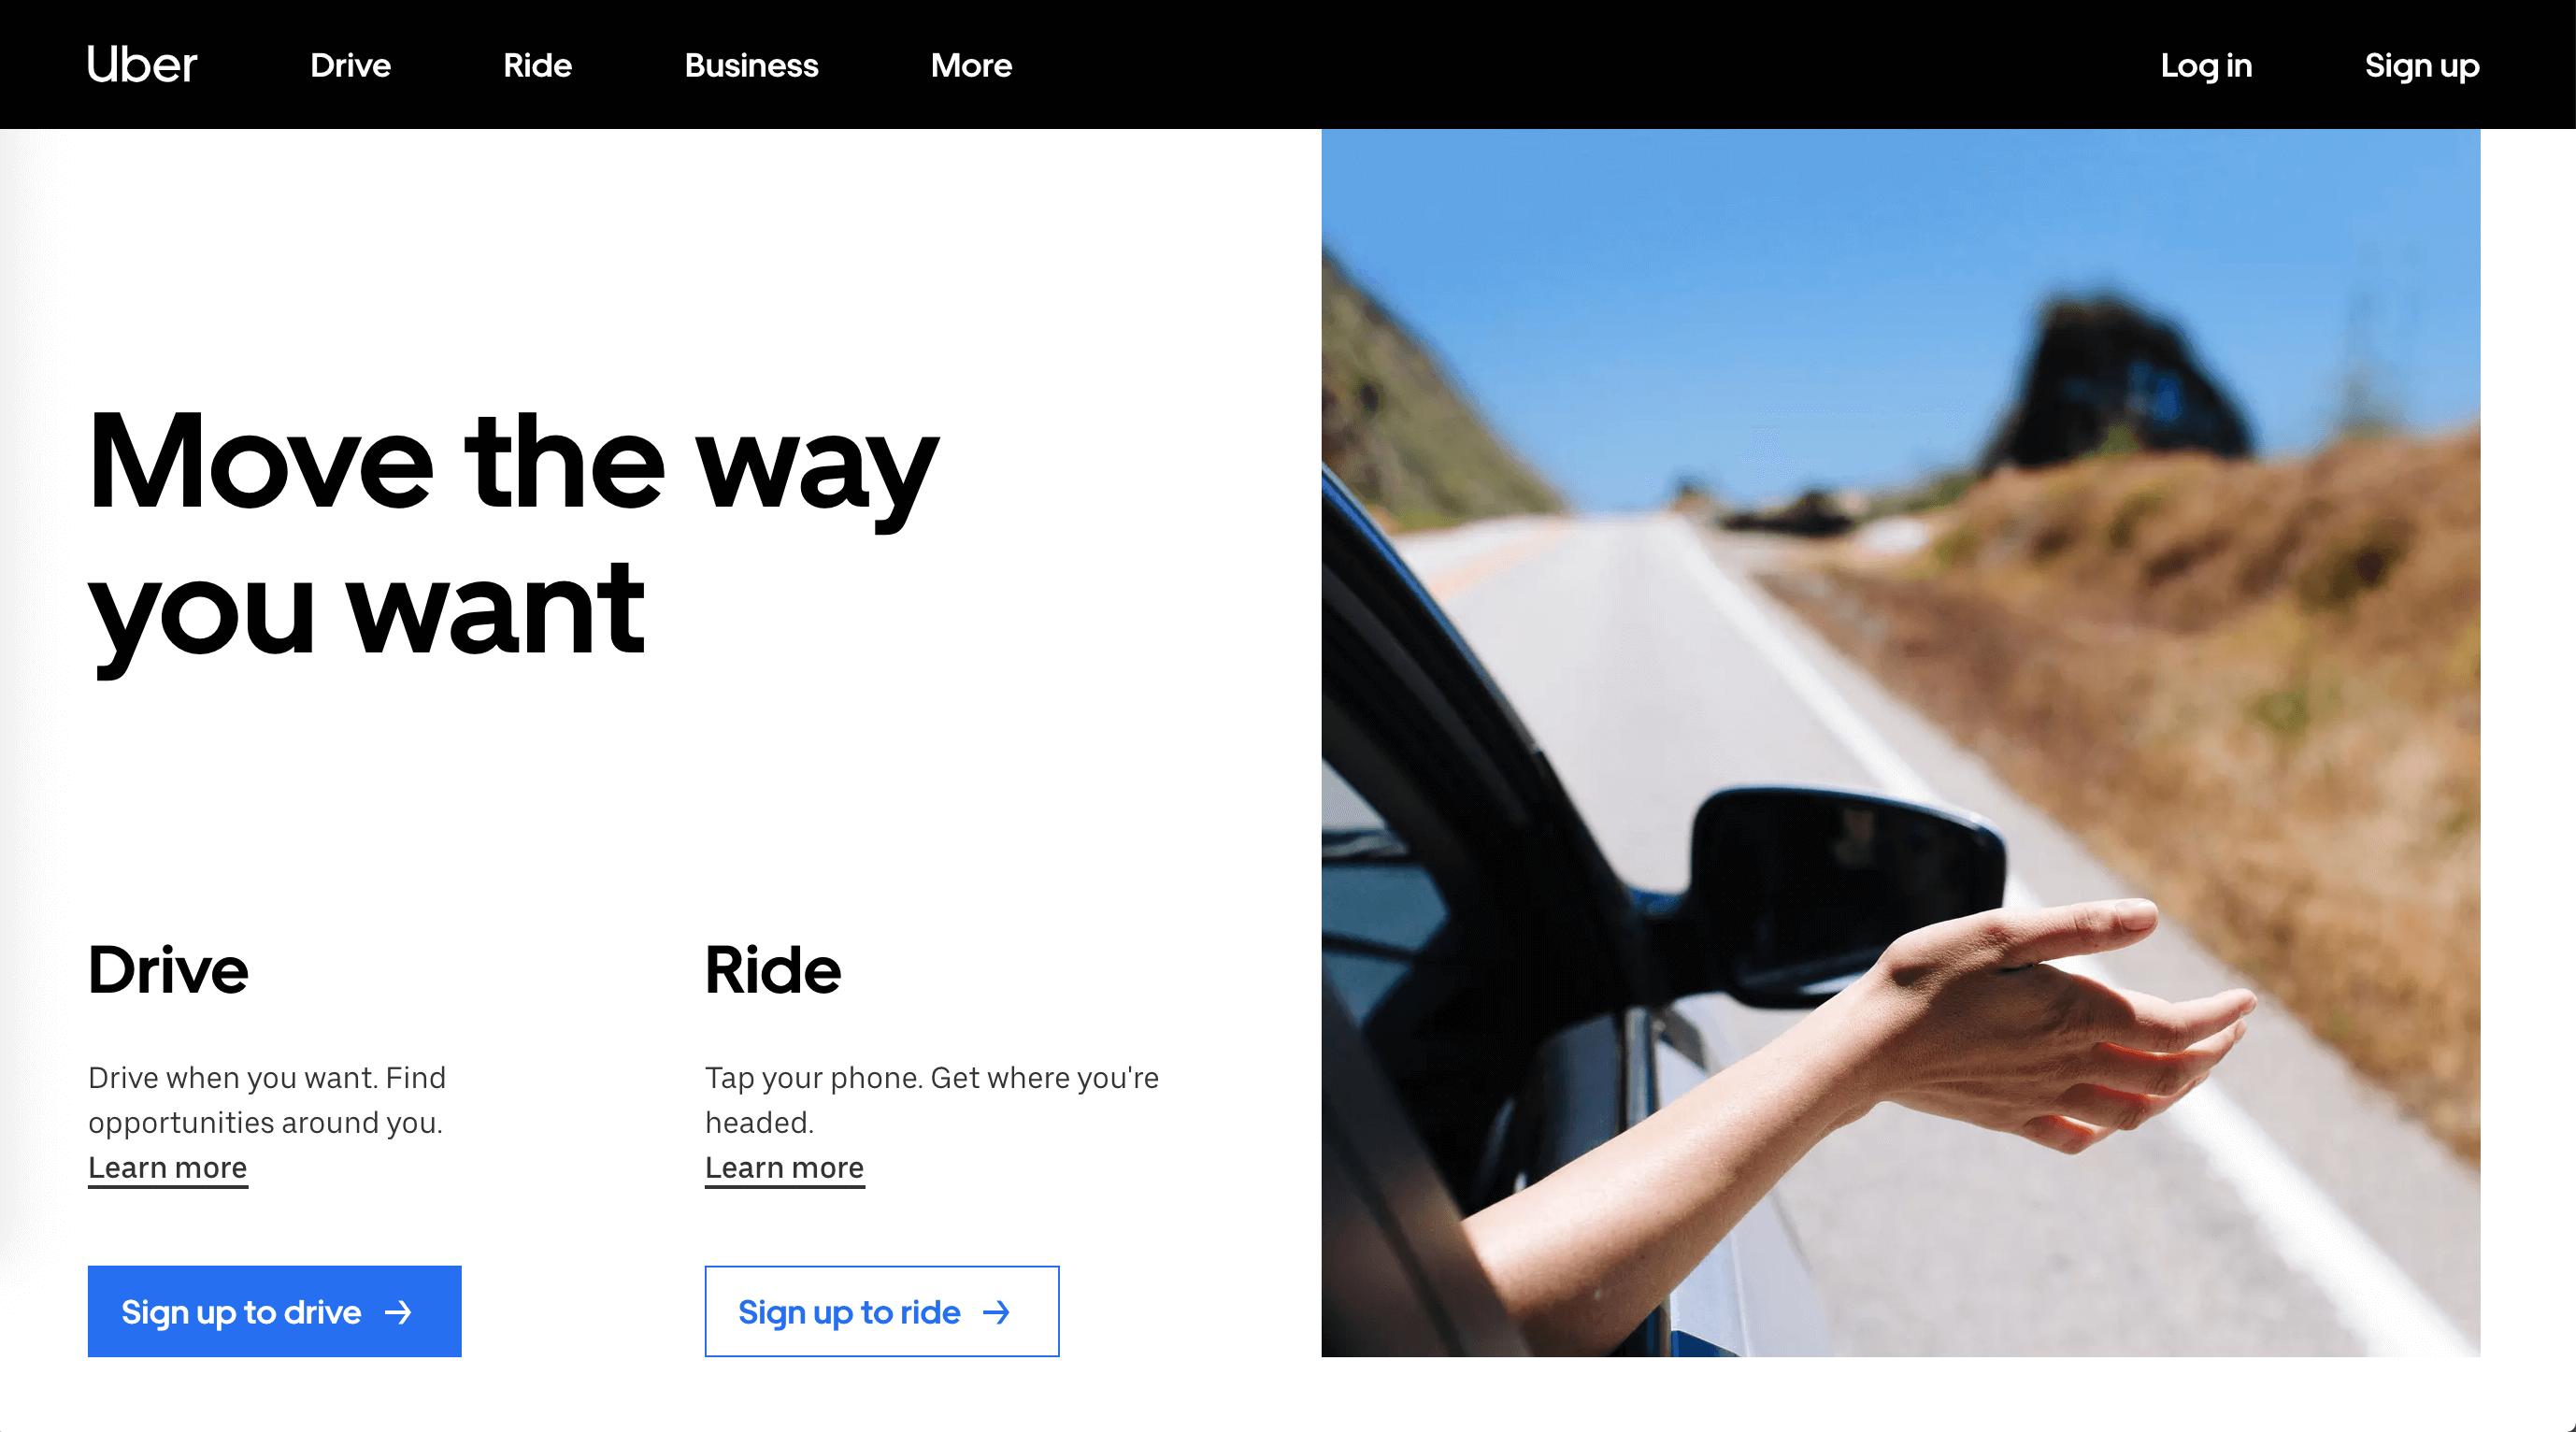 ux - User needs Uber